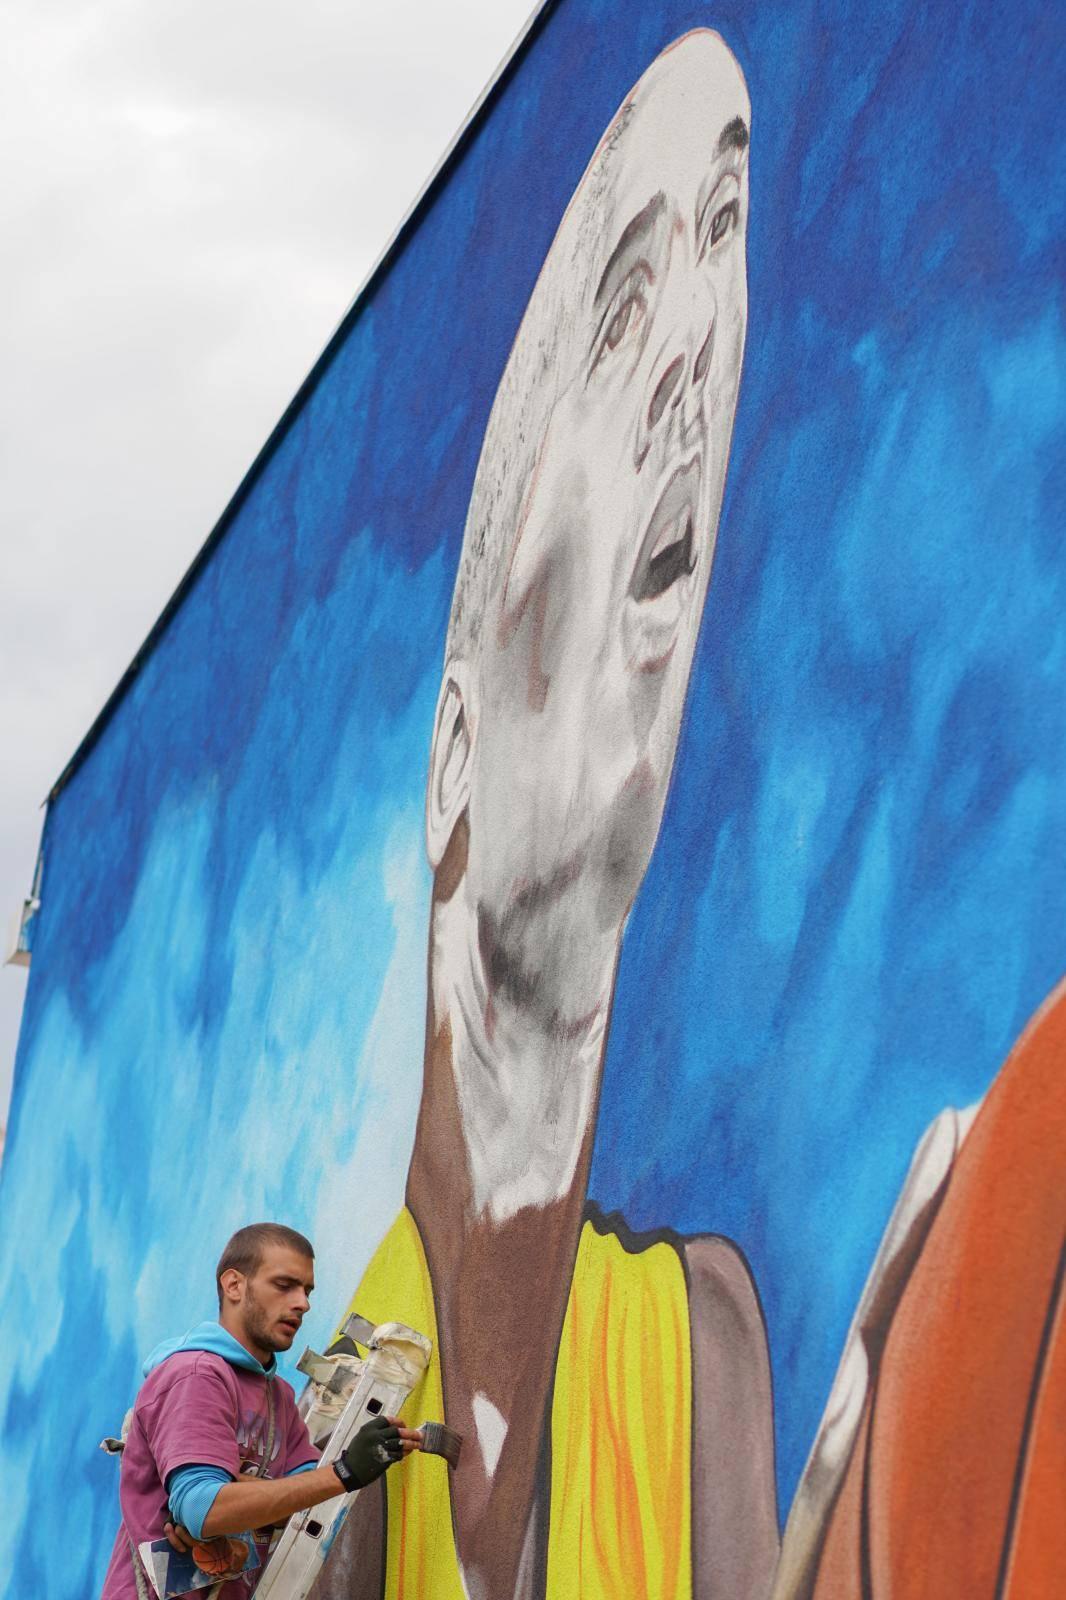 Bosanska Gradiška: Divovski mural Kobea Bryanta uz košarkaško igralište osnovne škole